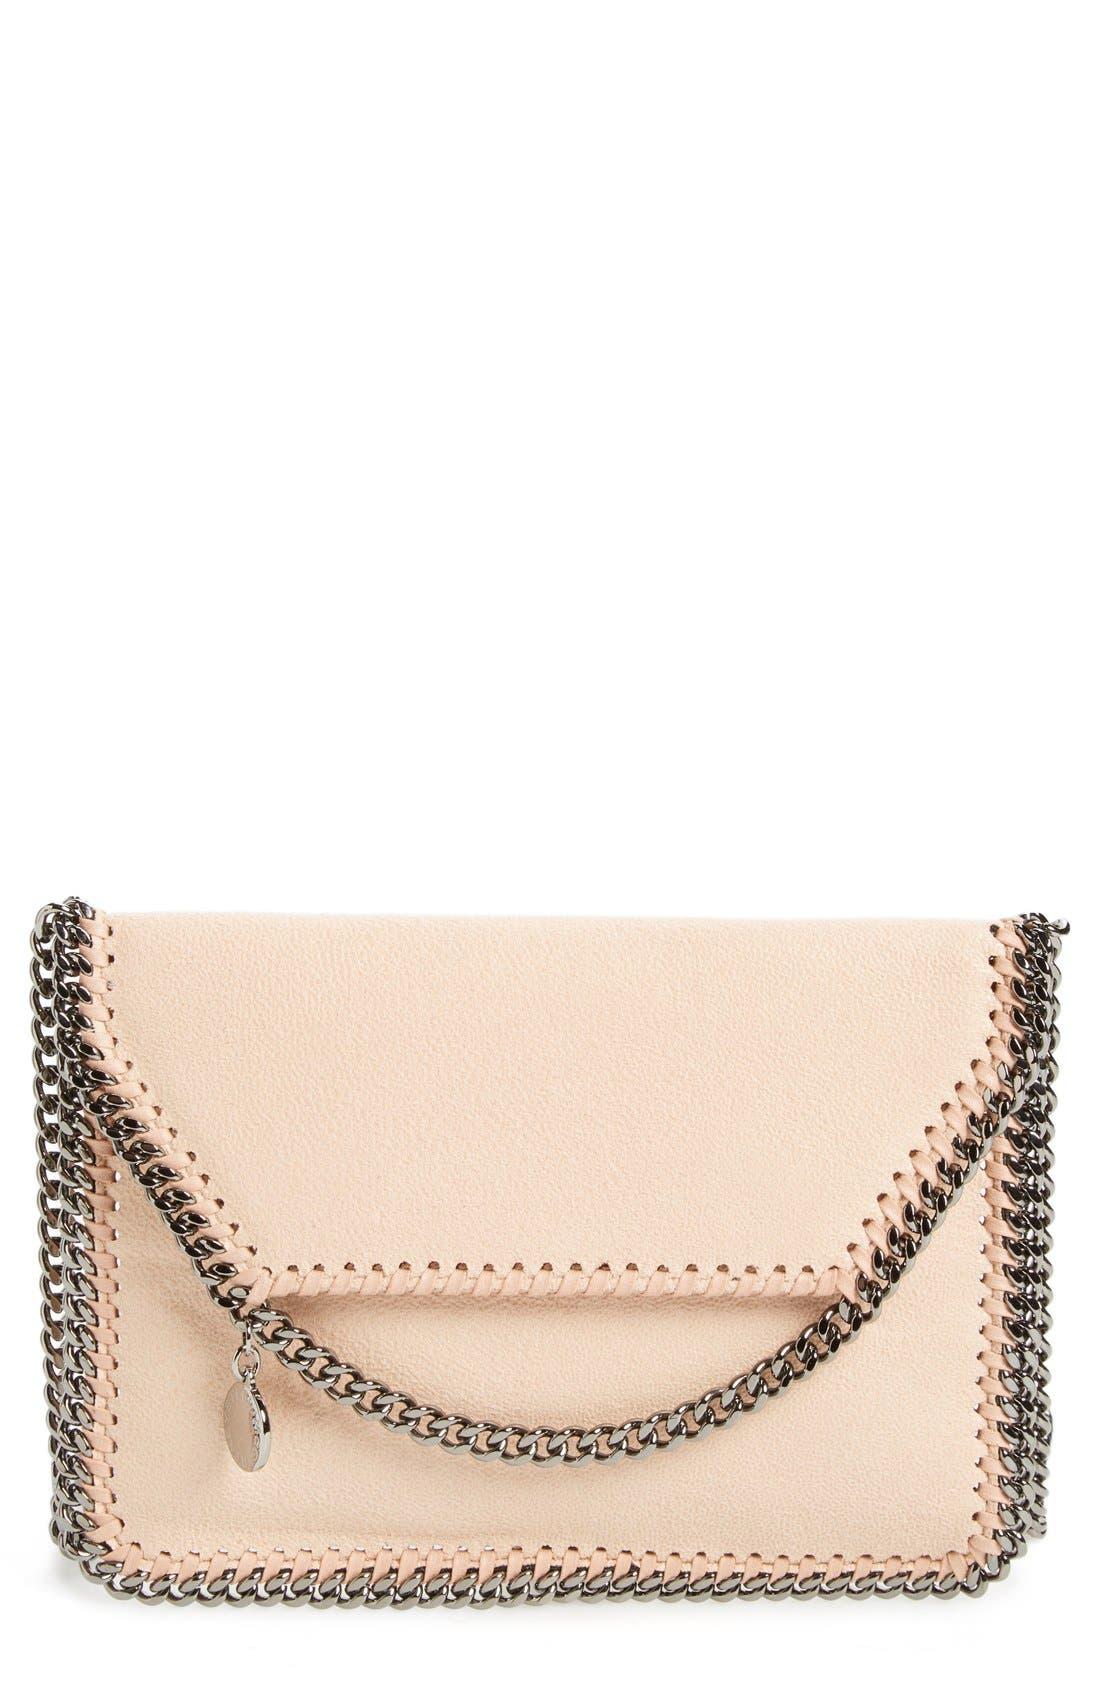 Main Image - Stella McCartney 'Mini Falabella - Shaggy Deer' Faux Leather Crossbody Bag